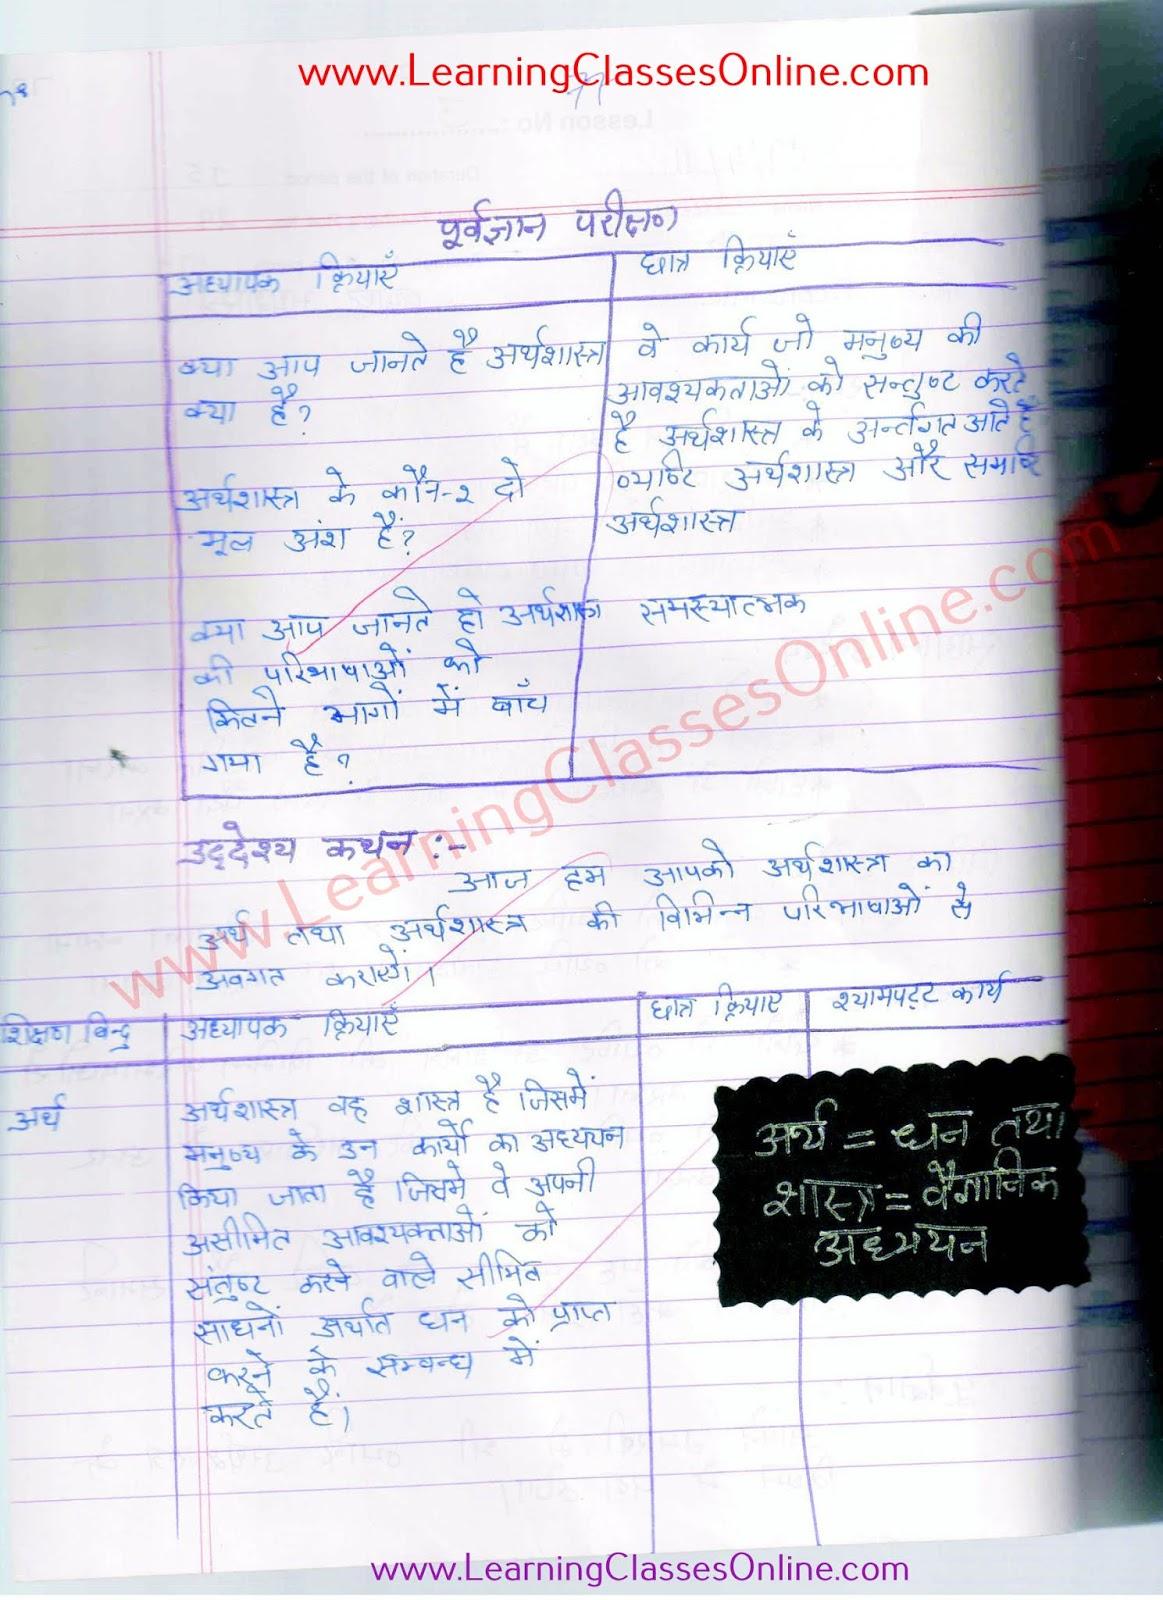 vyasti arthashastra lesson plan economics in hindi